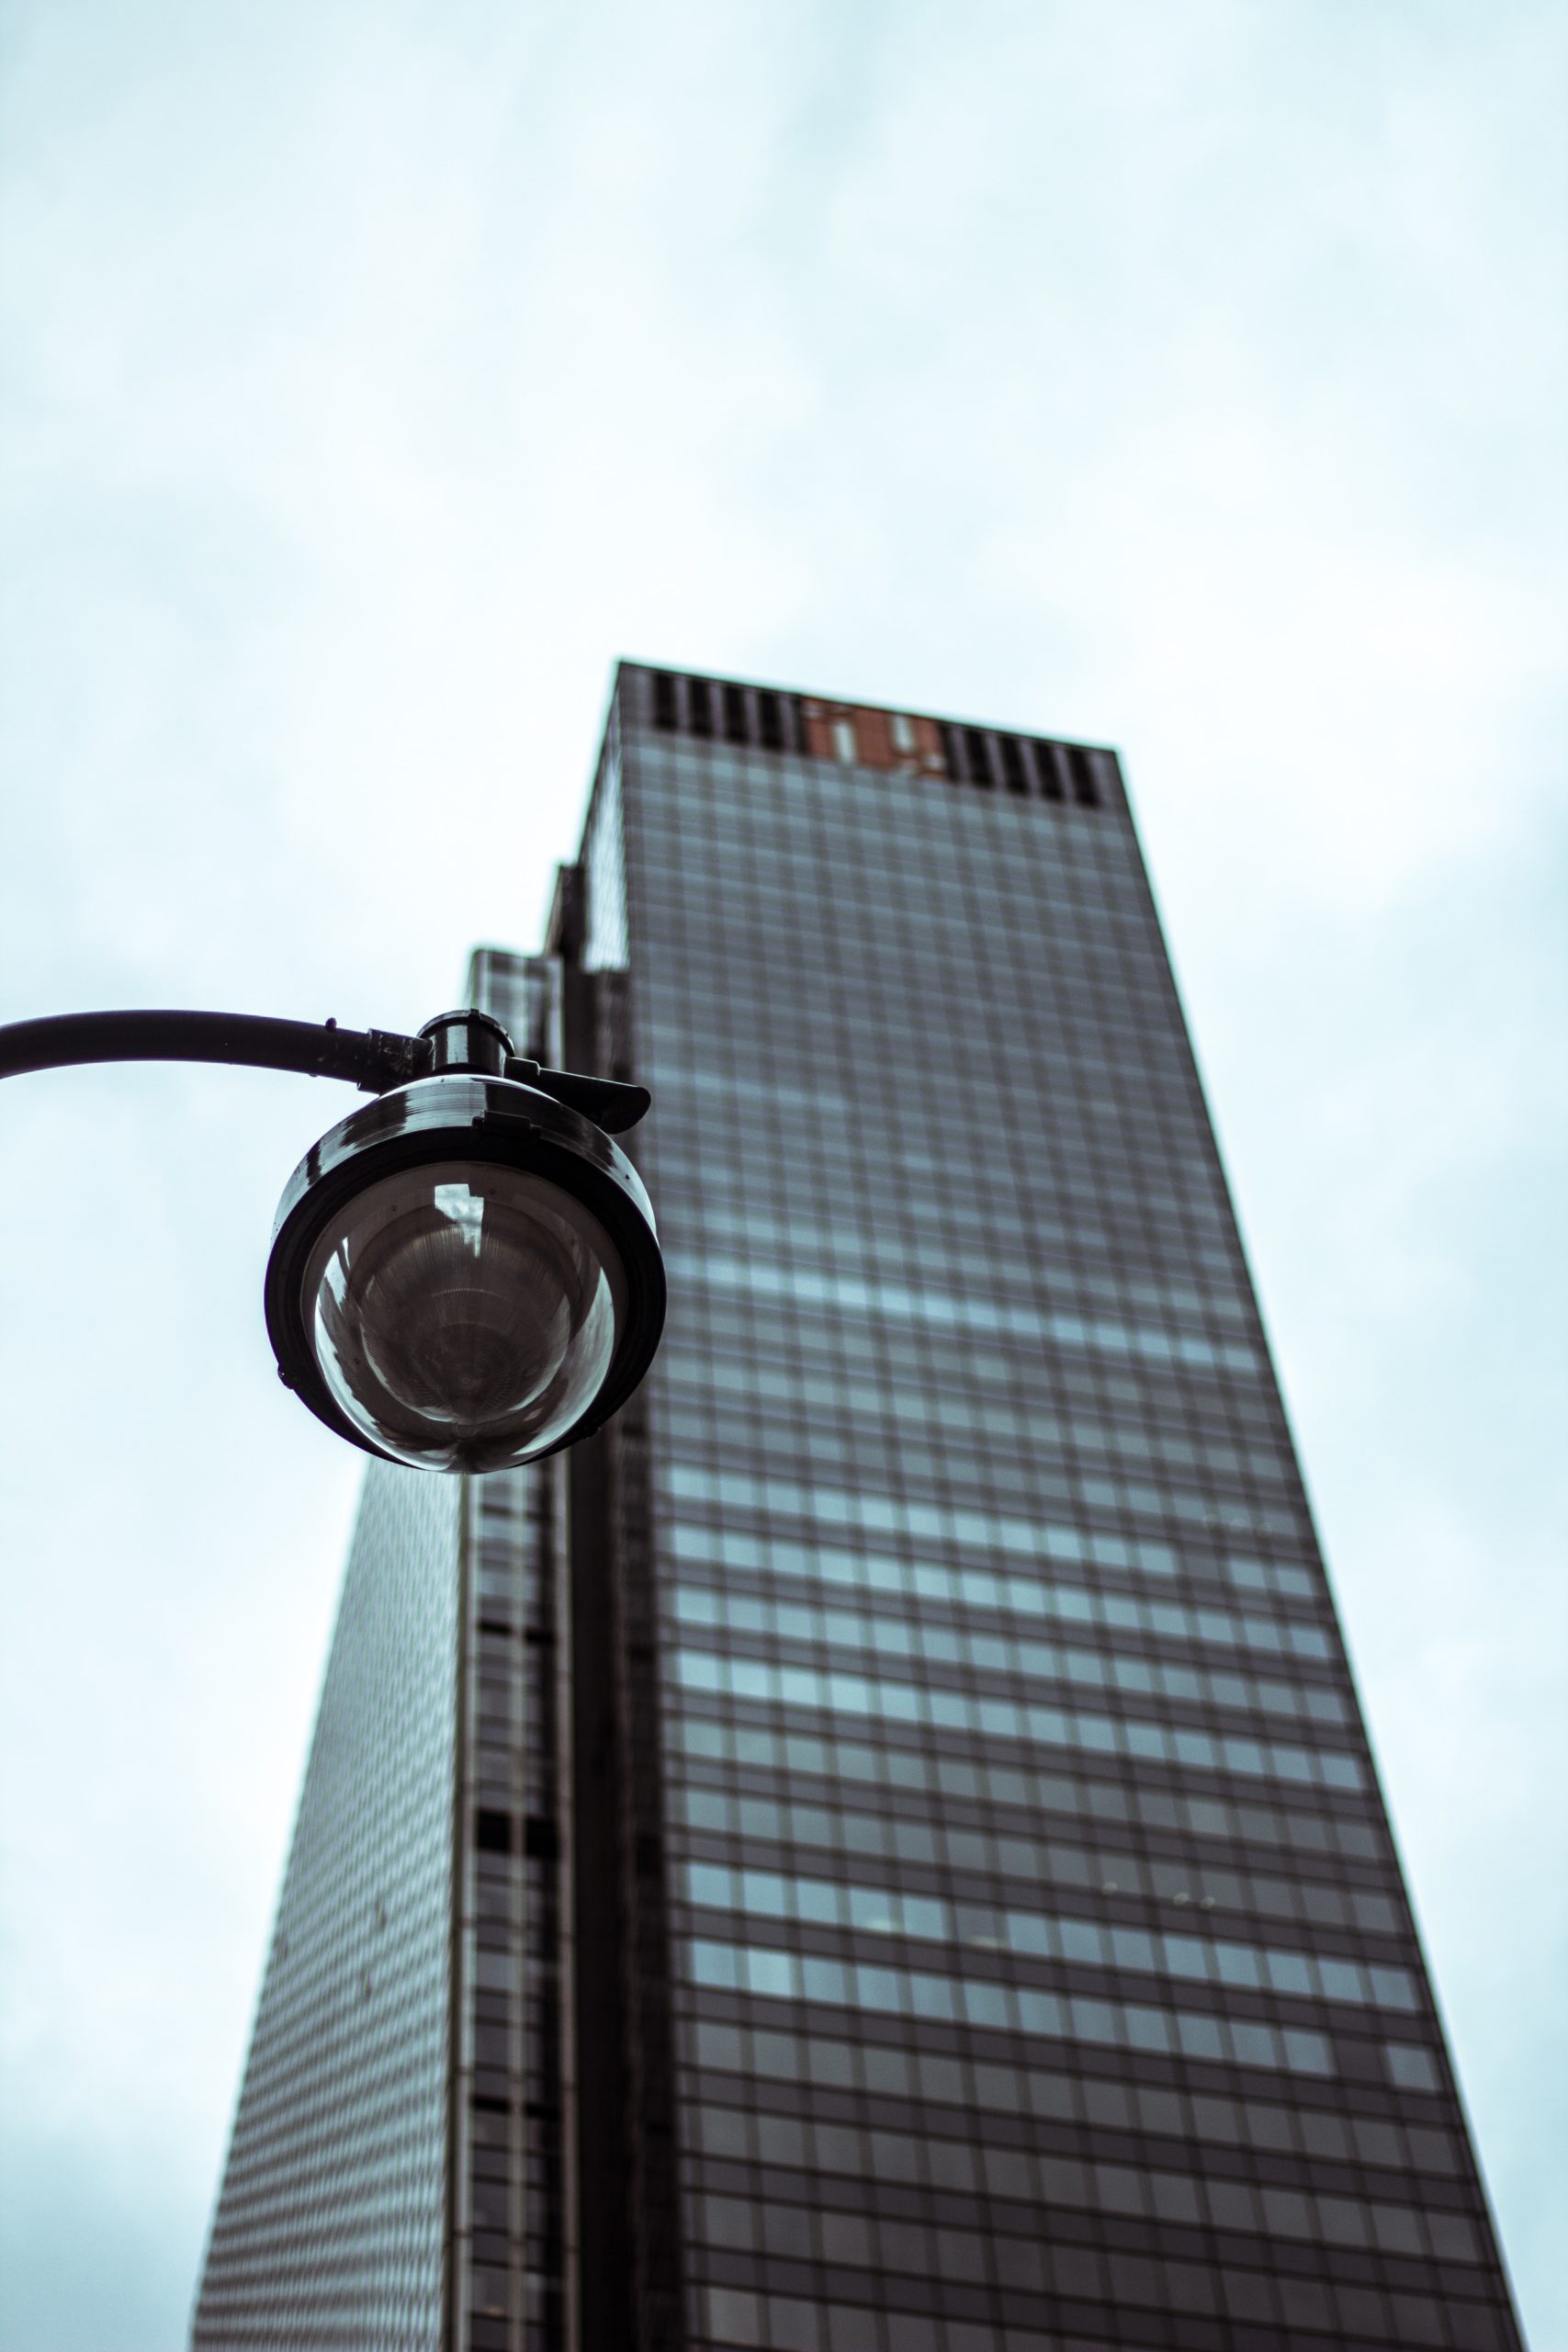 Cámaras de vigilancia bluetooth: Características